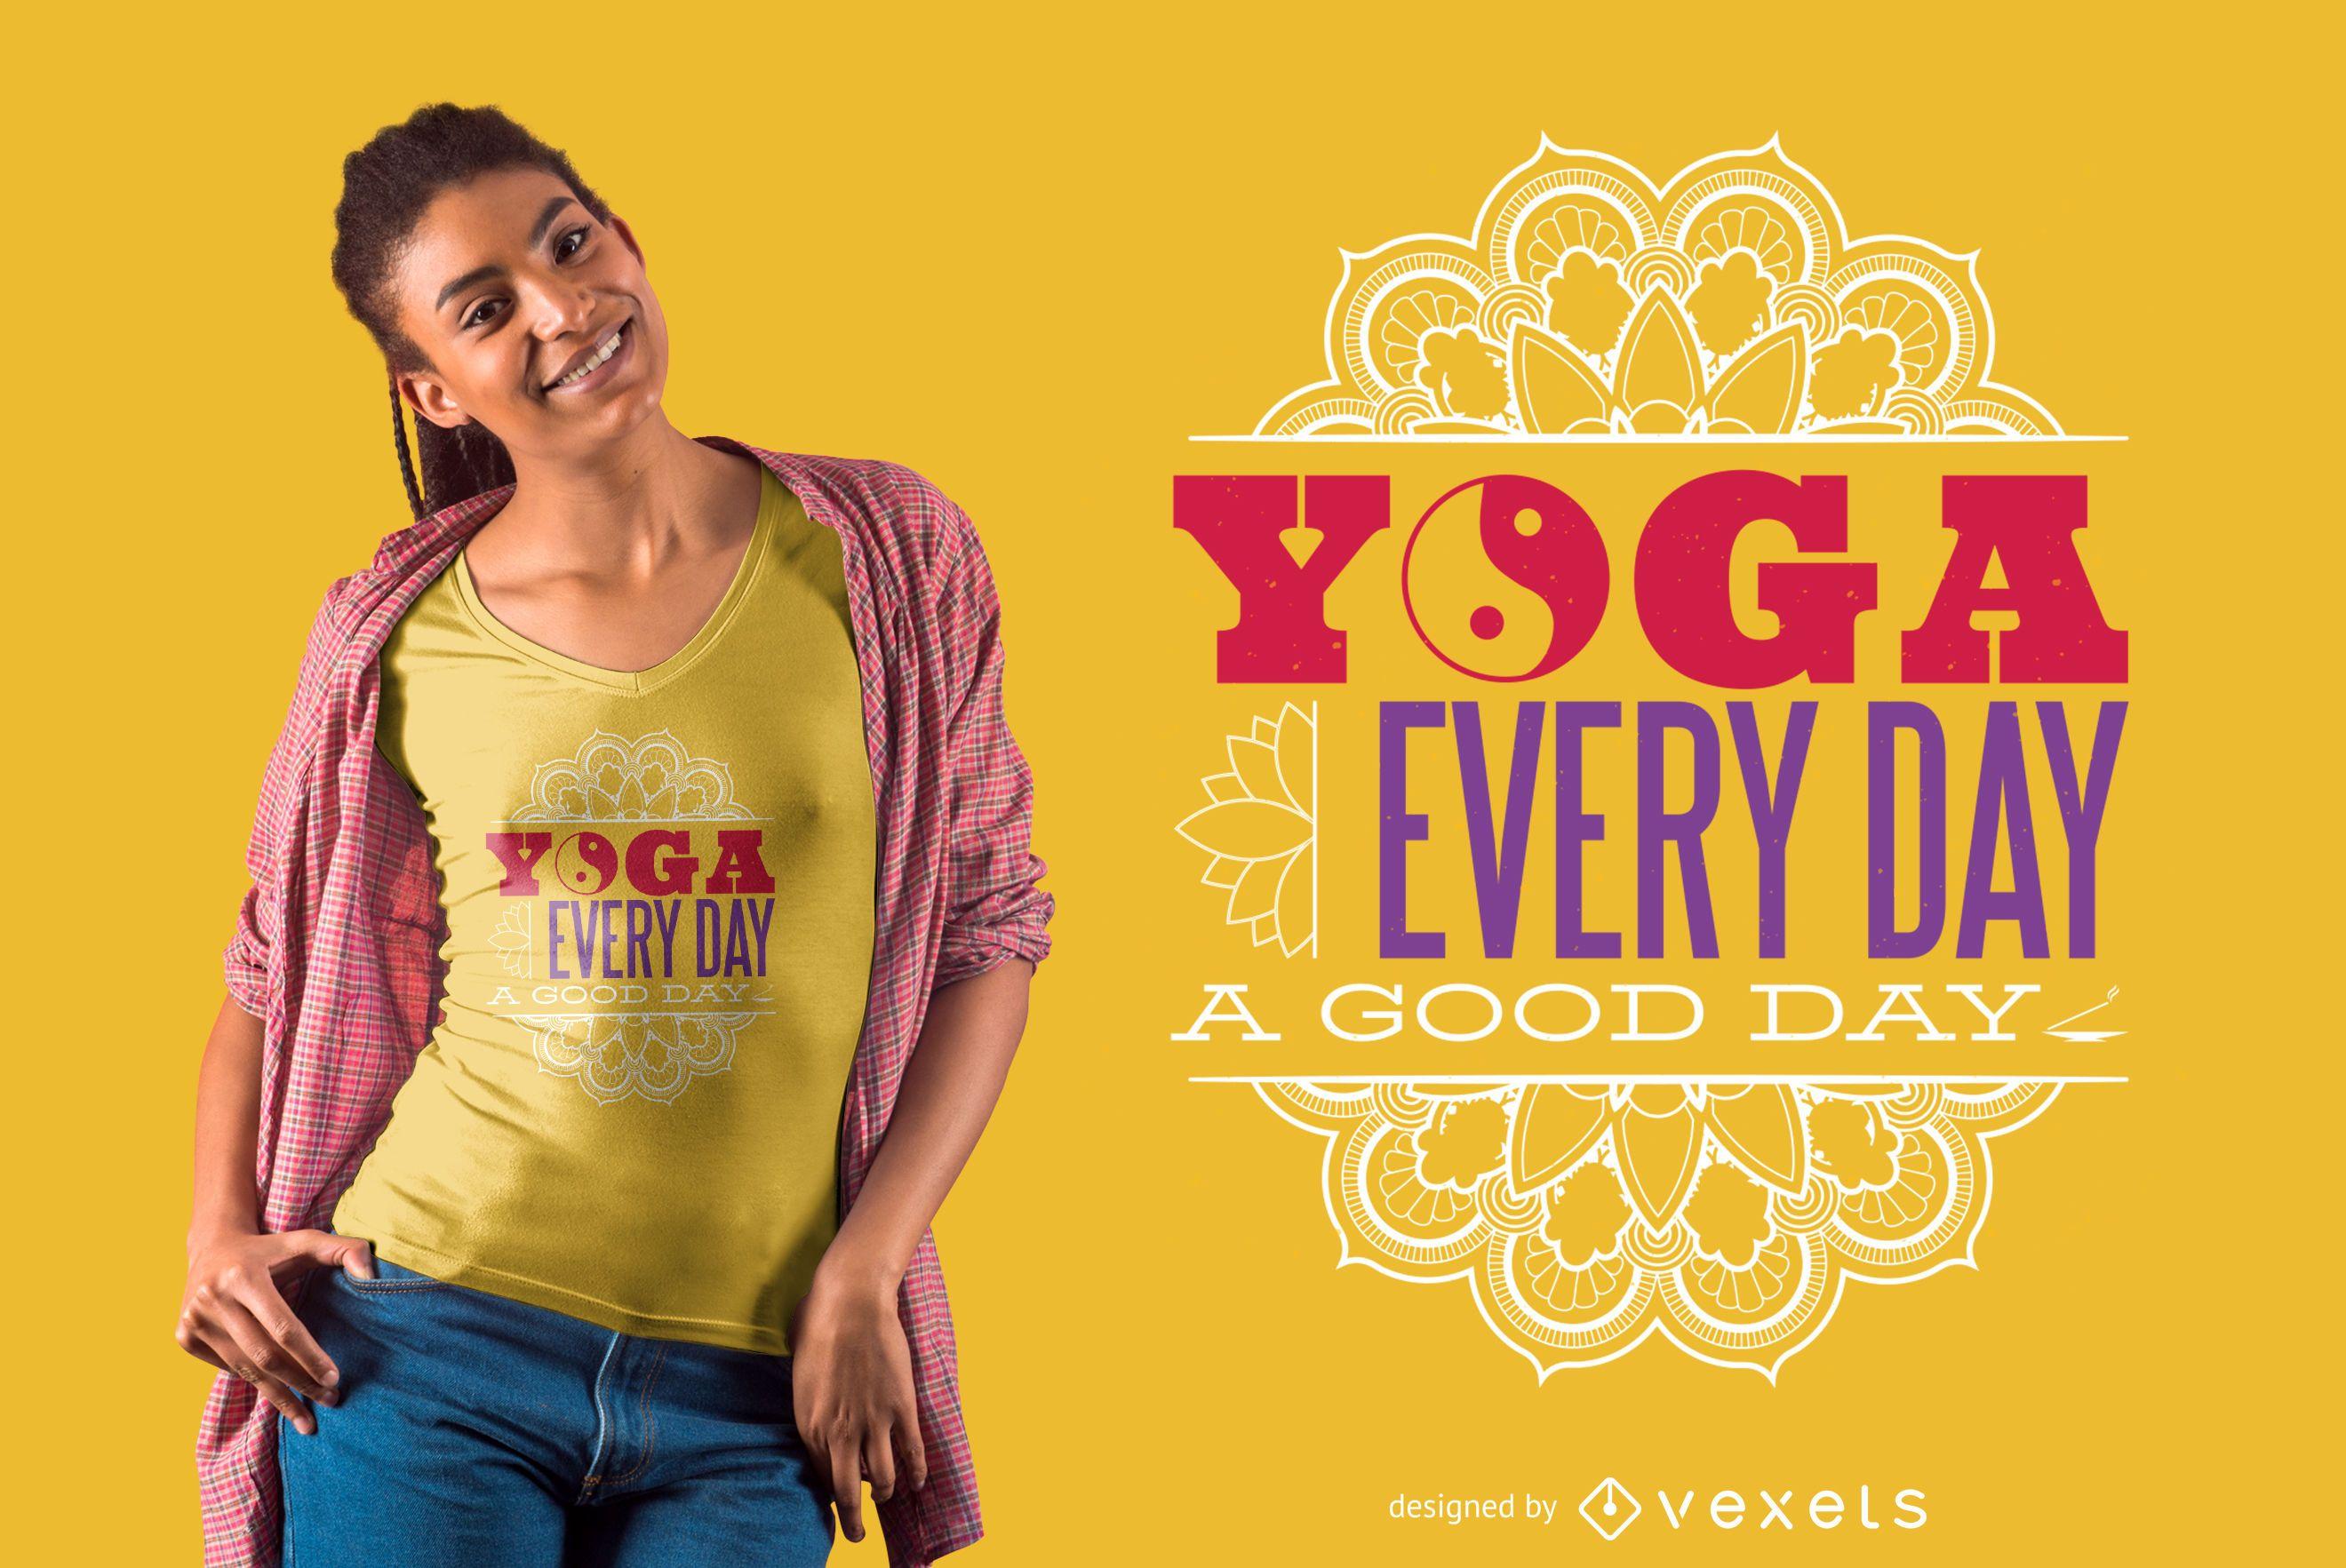 Yoga everyday t-shirt design